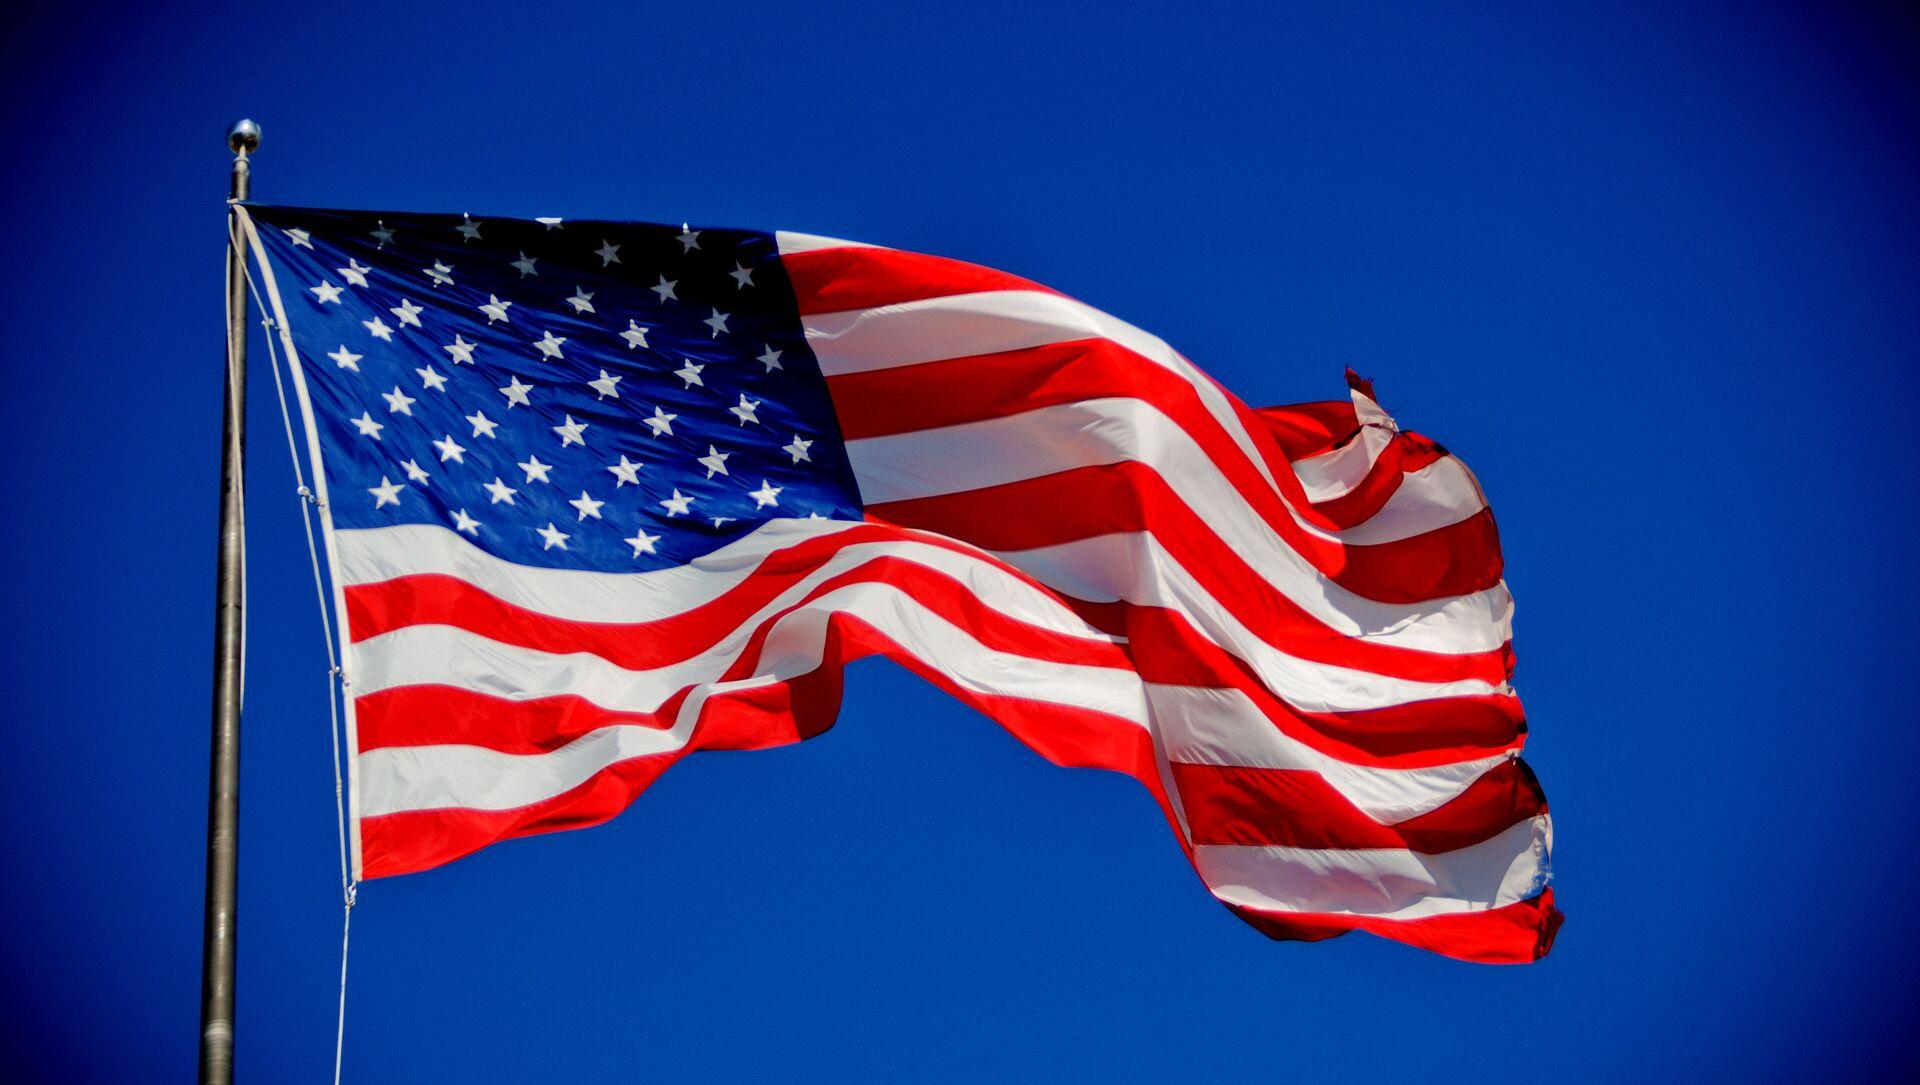 La bandiera americana - Sputnik Italia, 1920, 04.03.2021